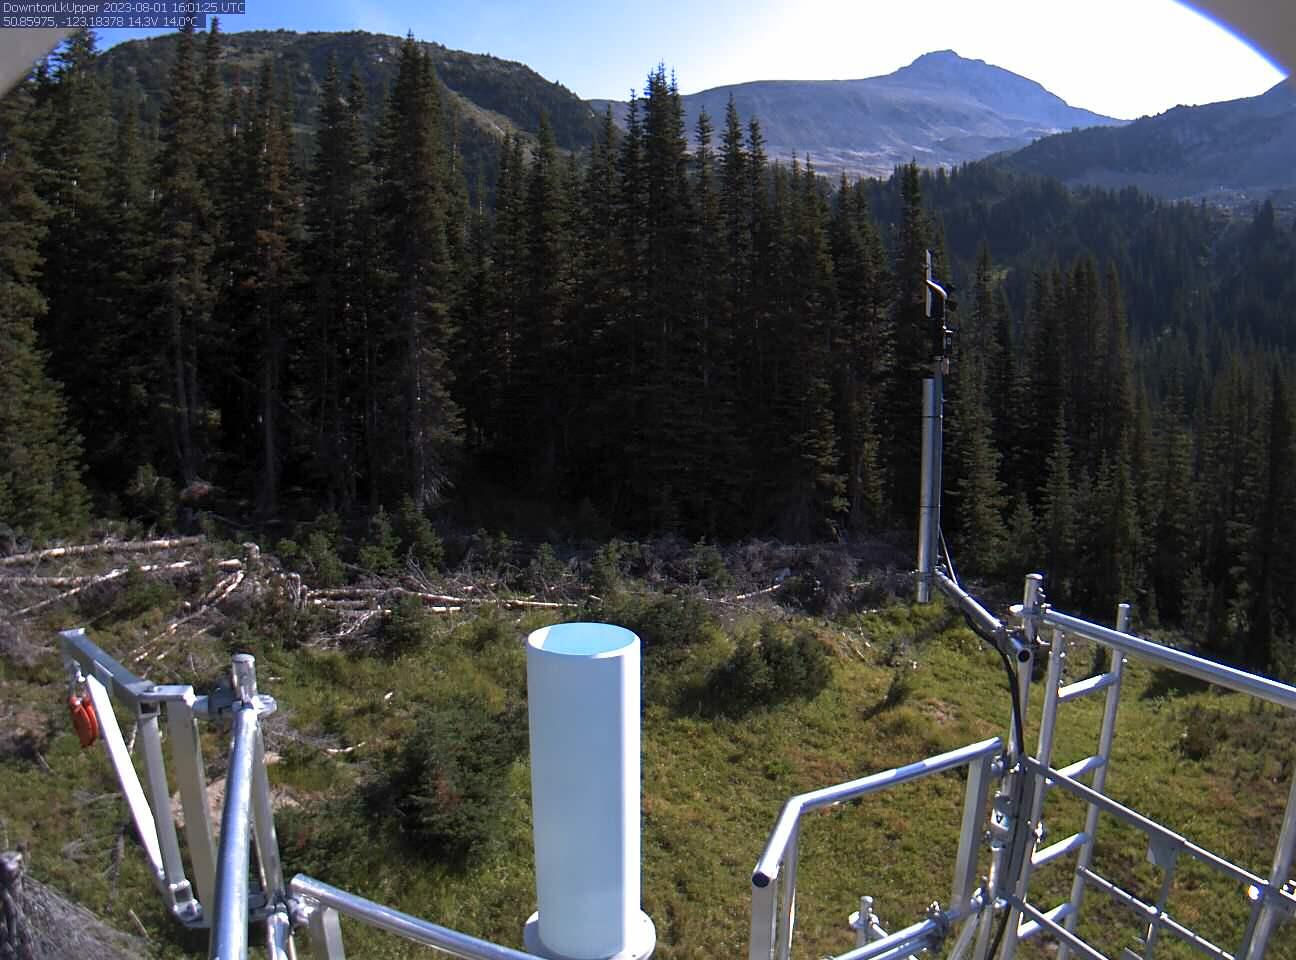 Downton Lake Upper Snow Satellite Camera